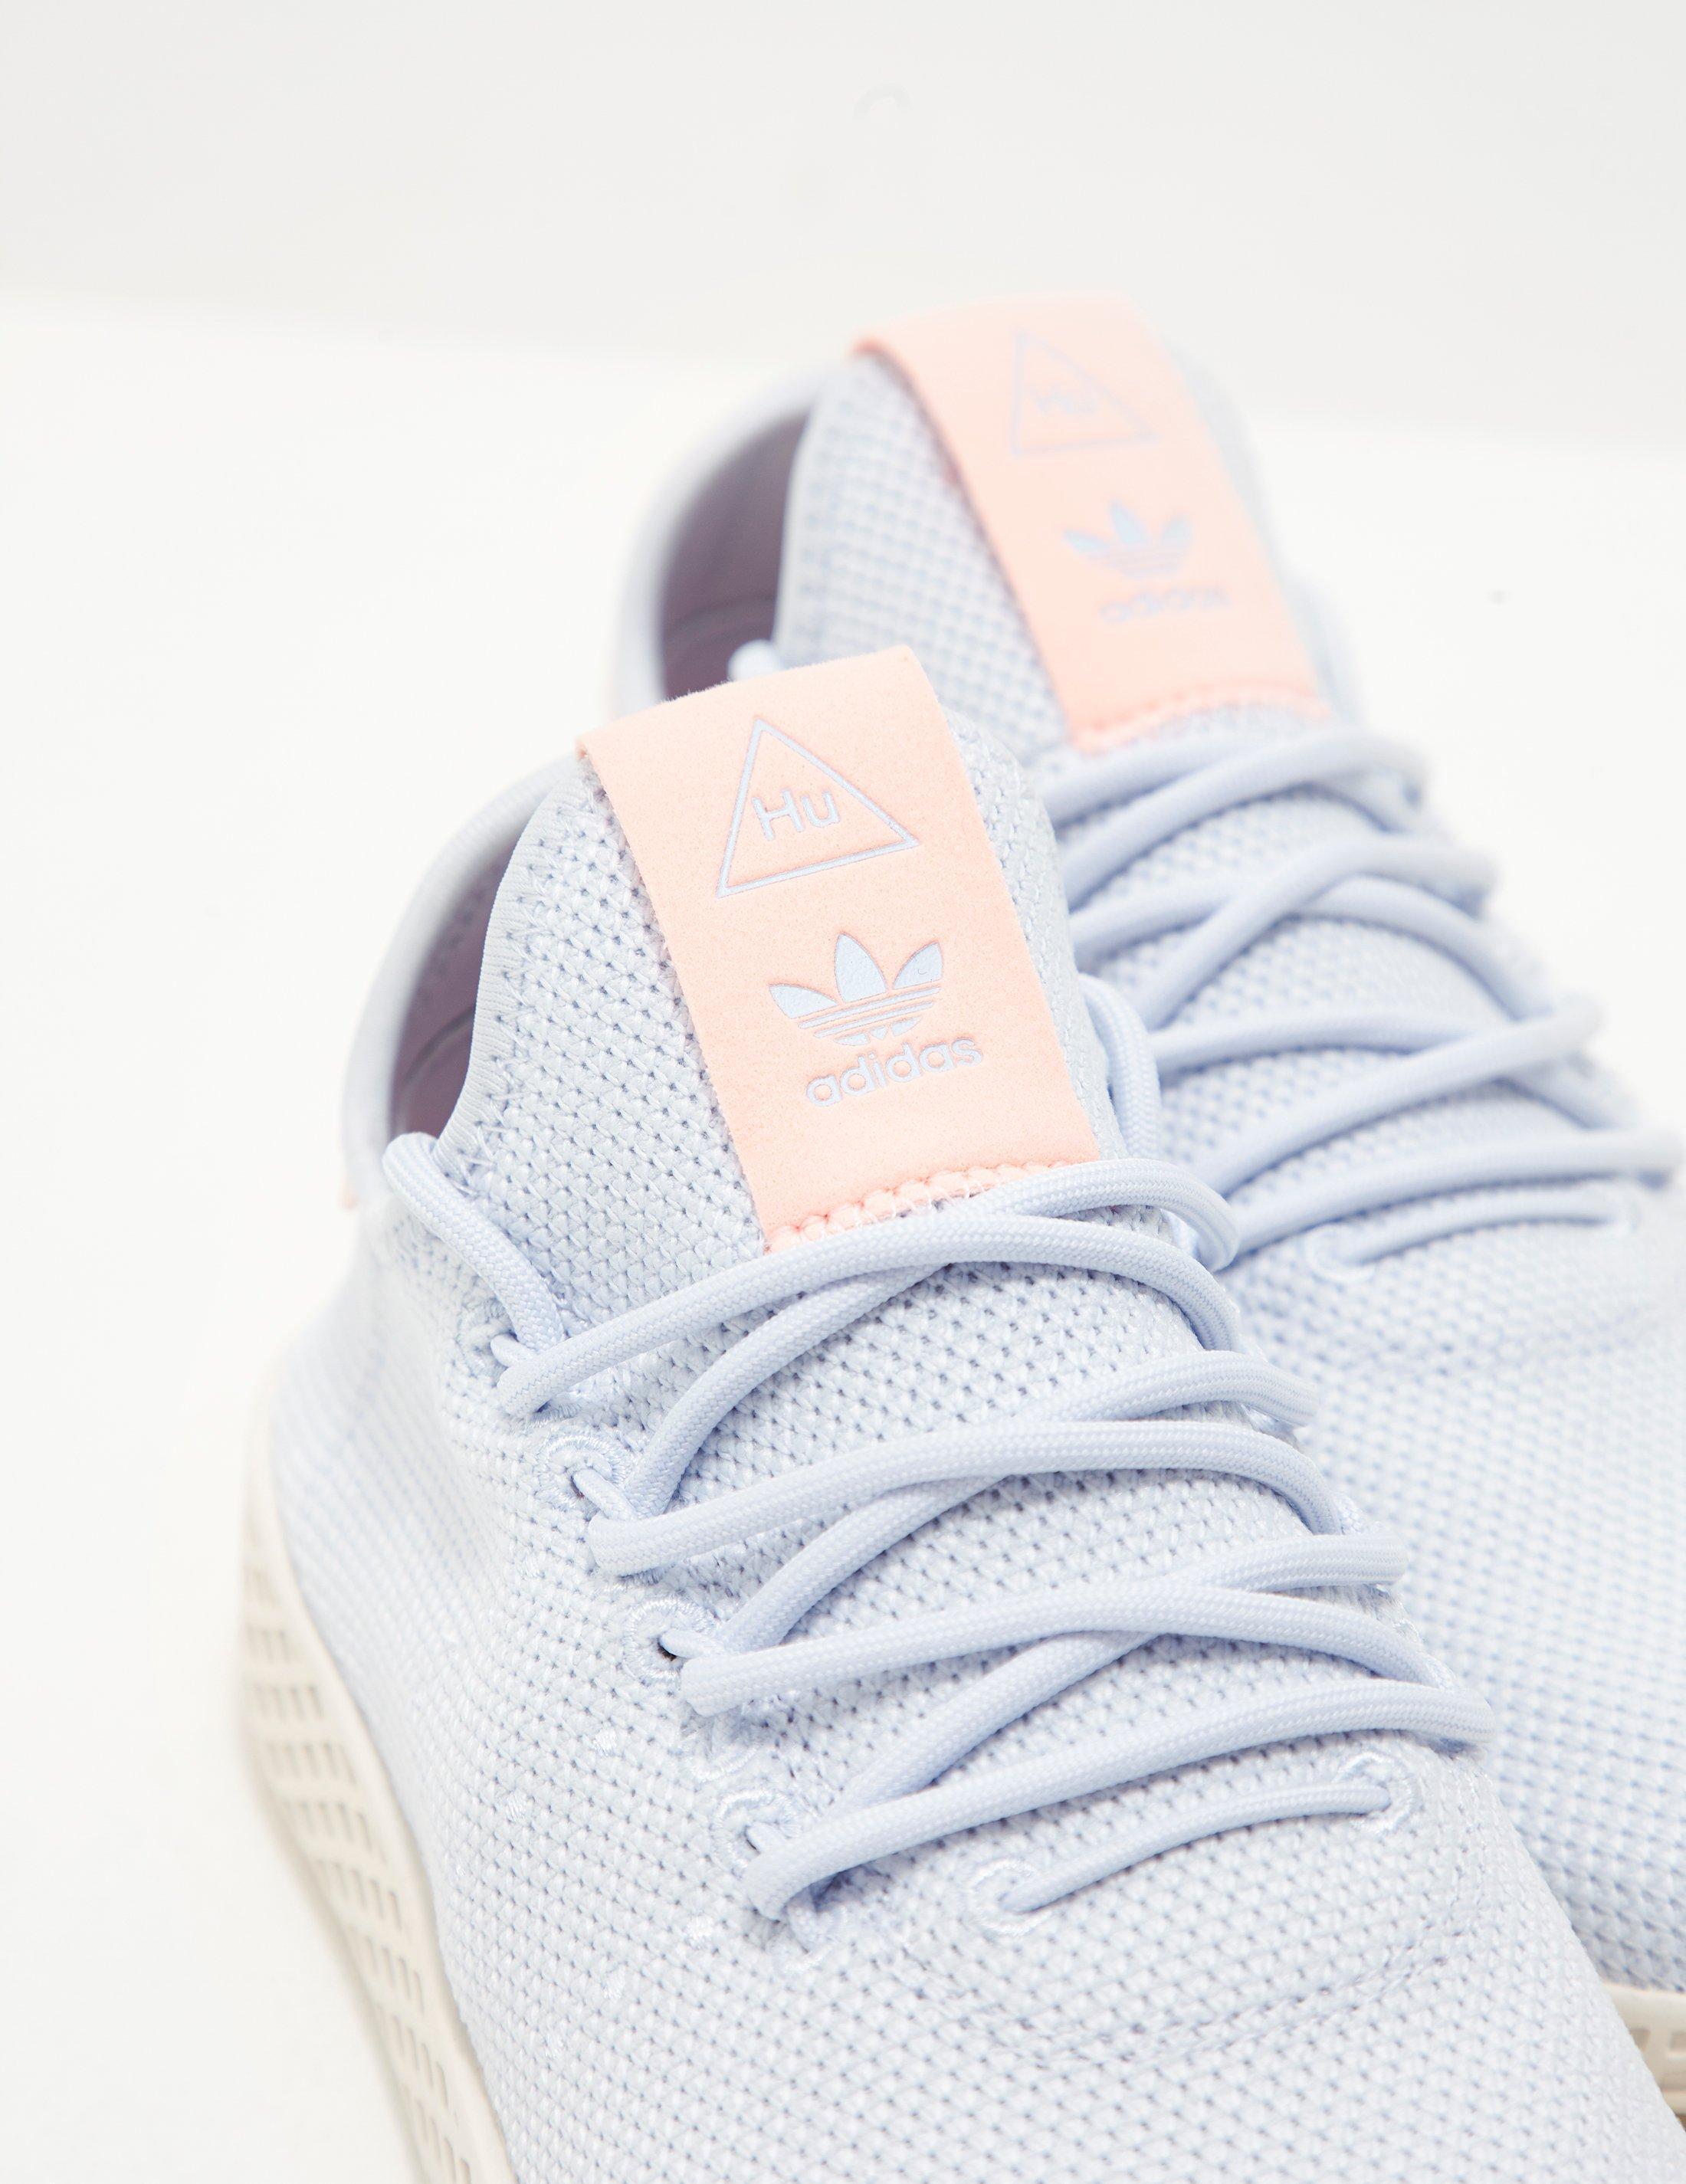 Lyst - adidas Originals Womens X Pharrell Williams Tennis Hu ... 16a29ad237